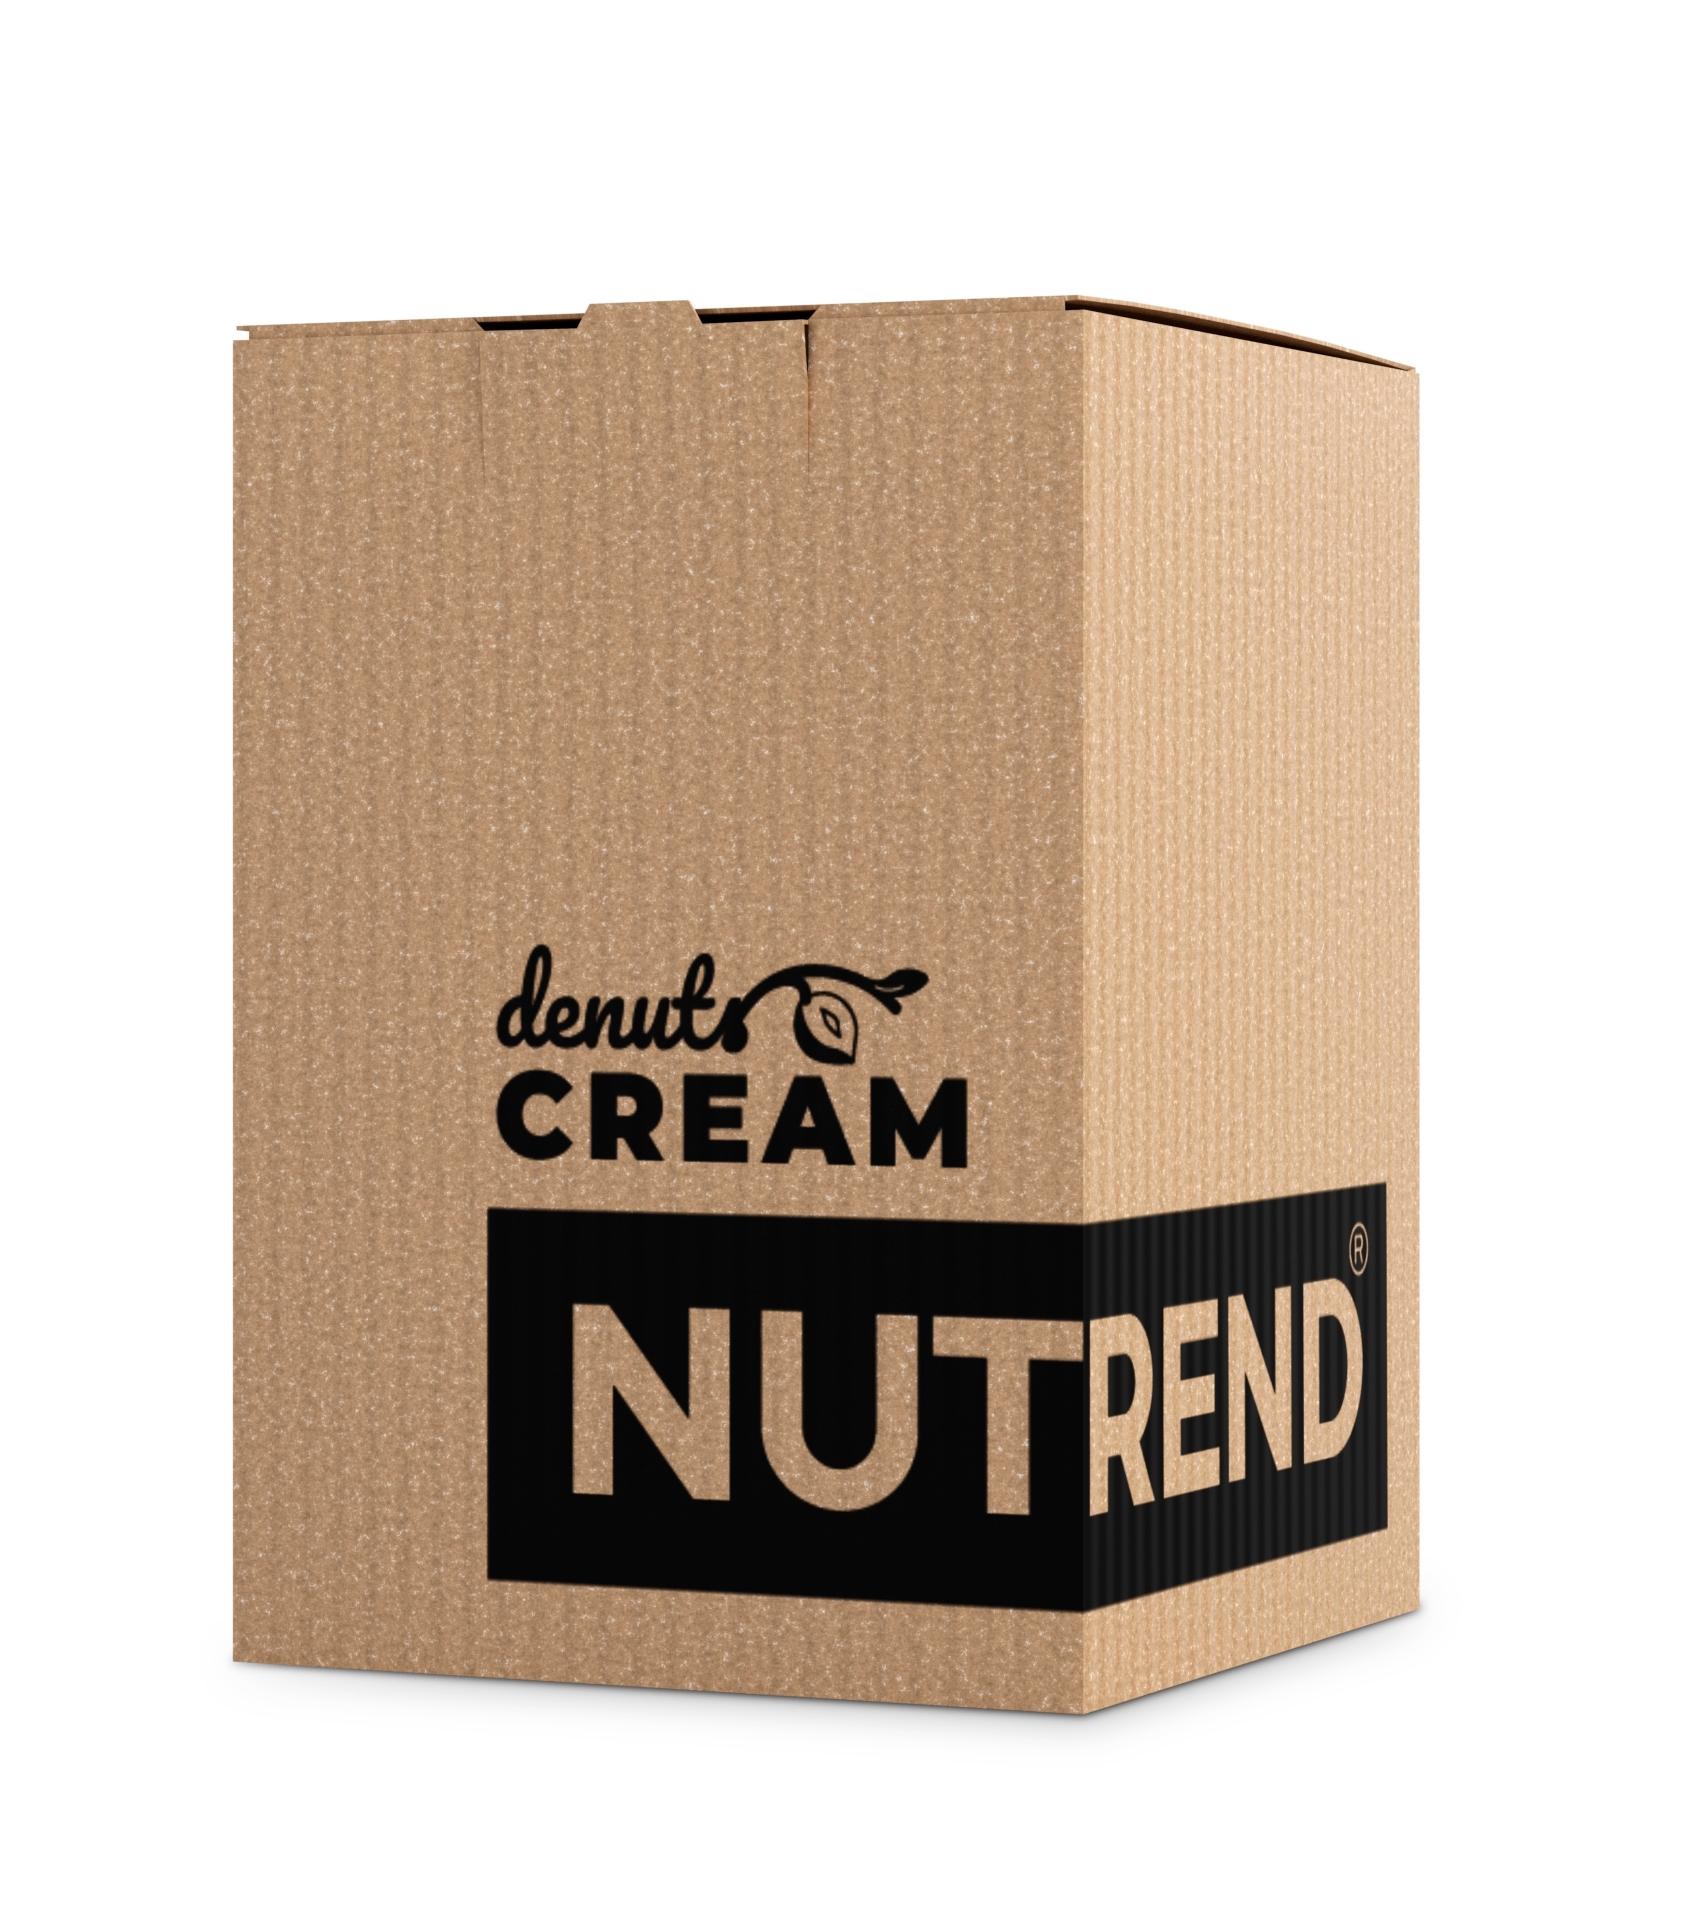 DENUTS CREAM 1000 g, arašídové máslo